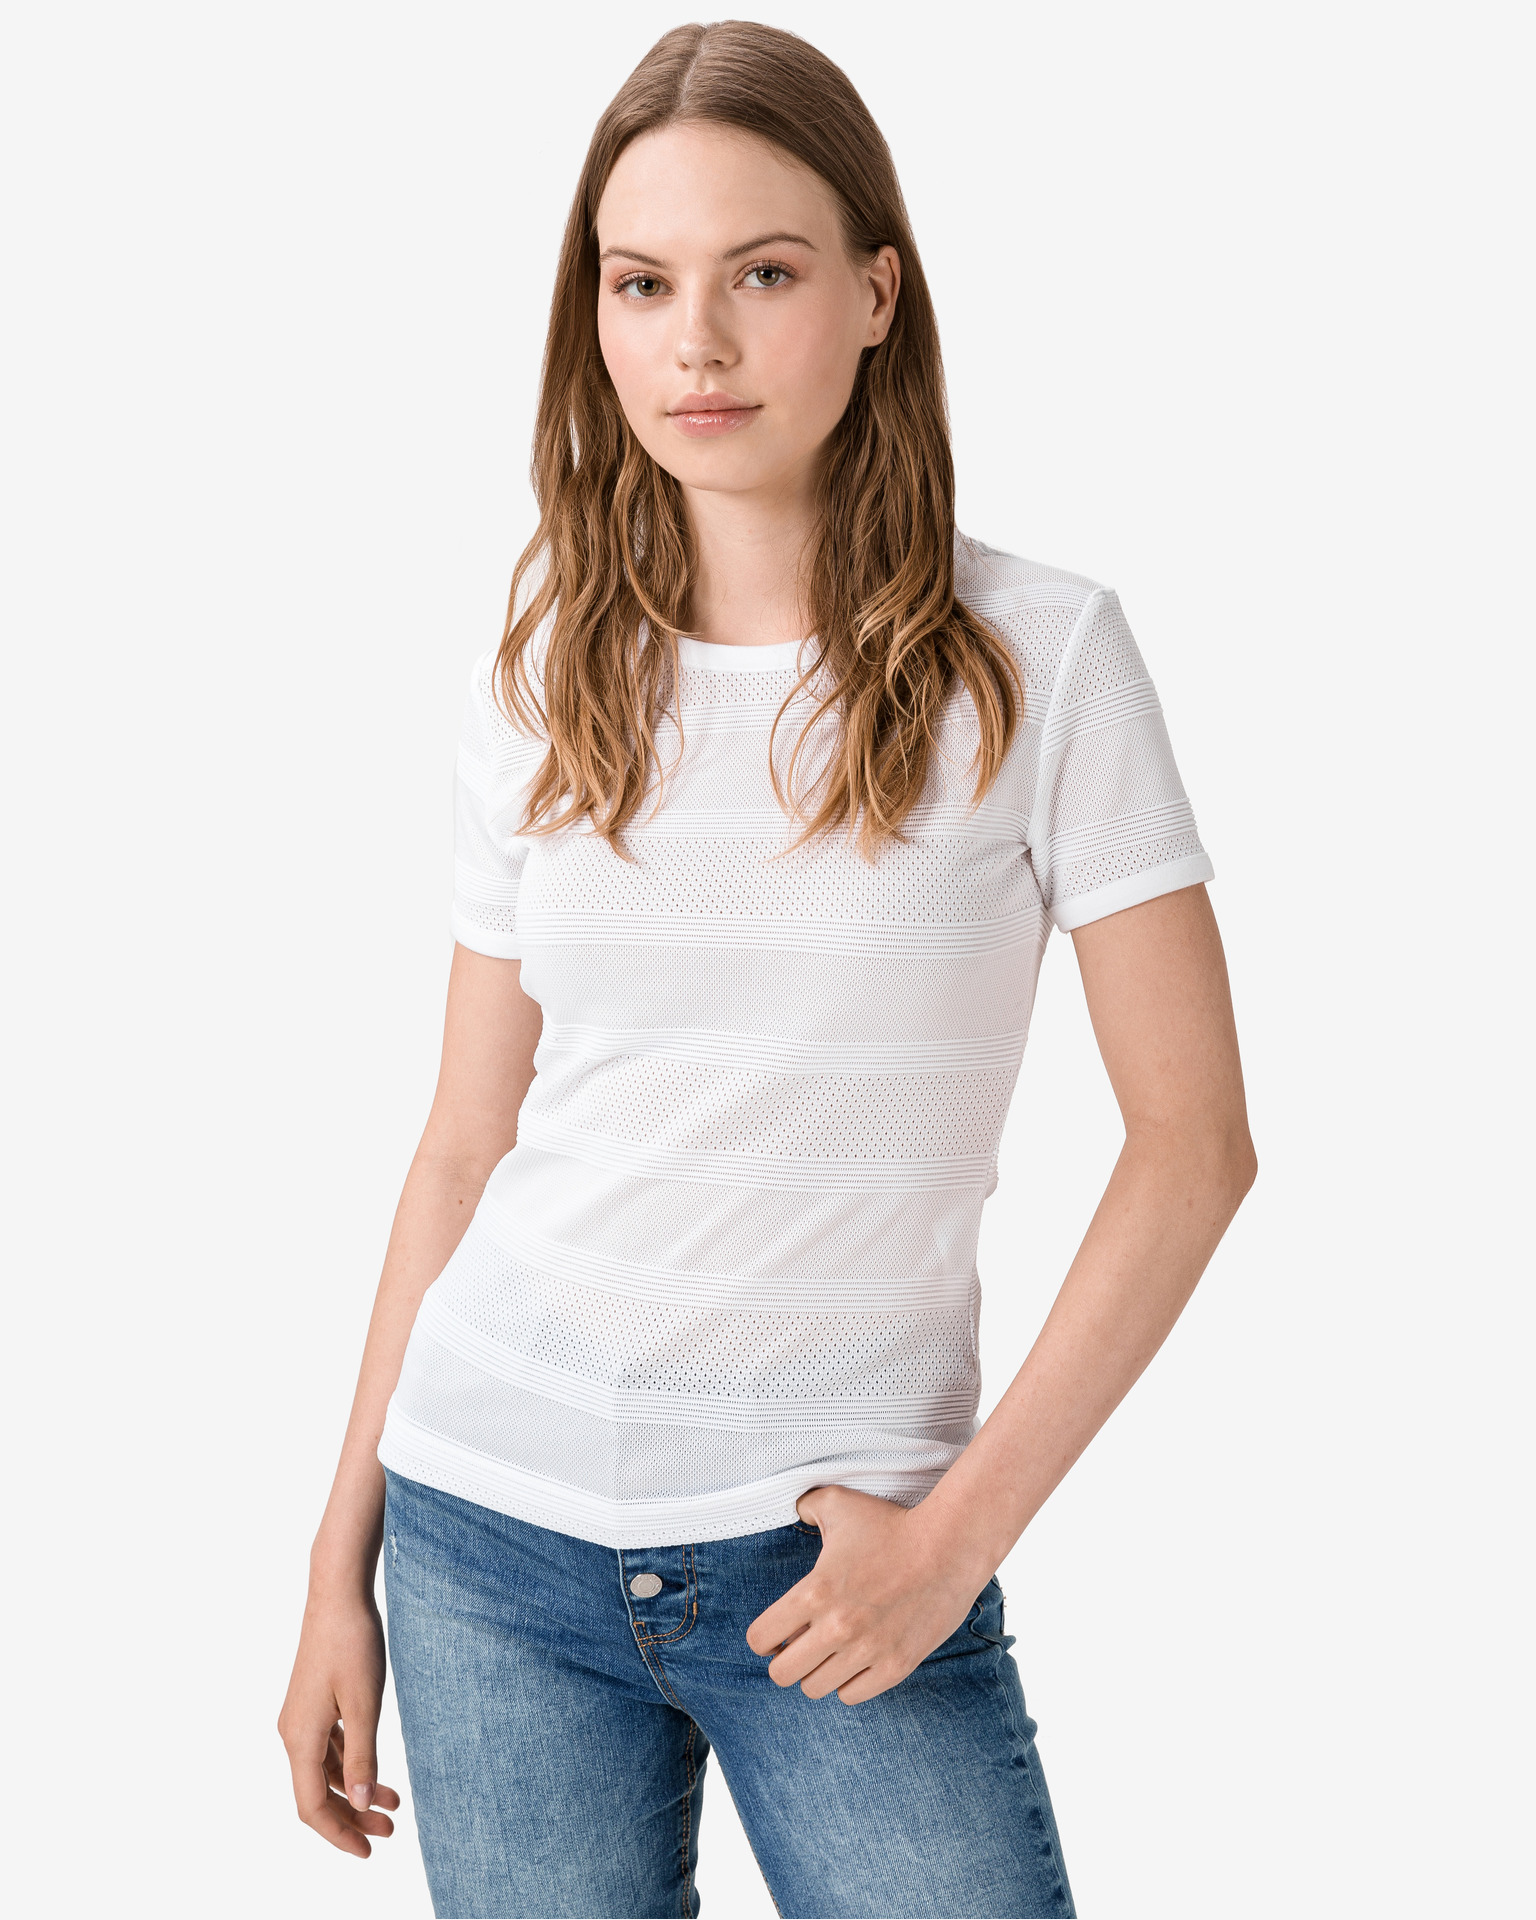 Guess Koszulka damska biały Top